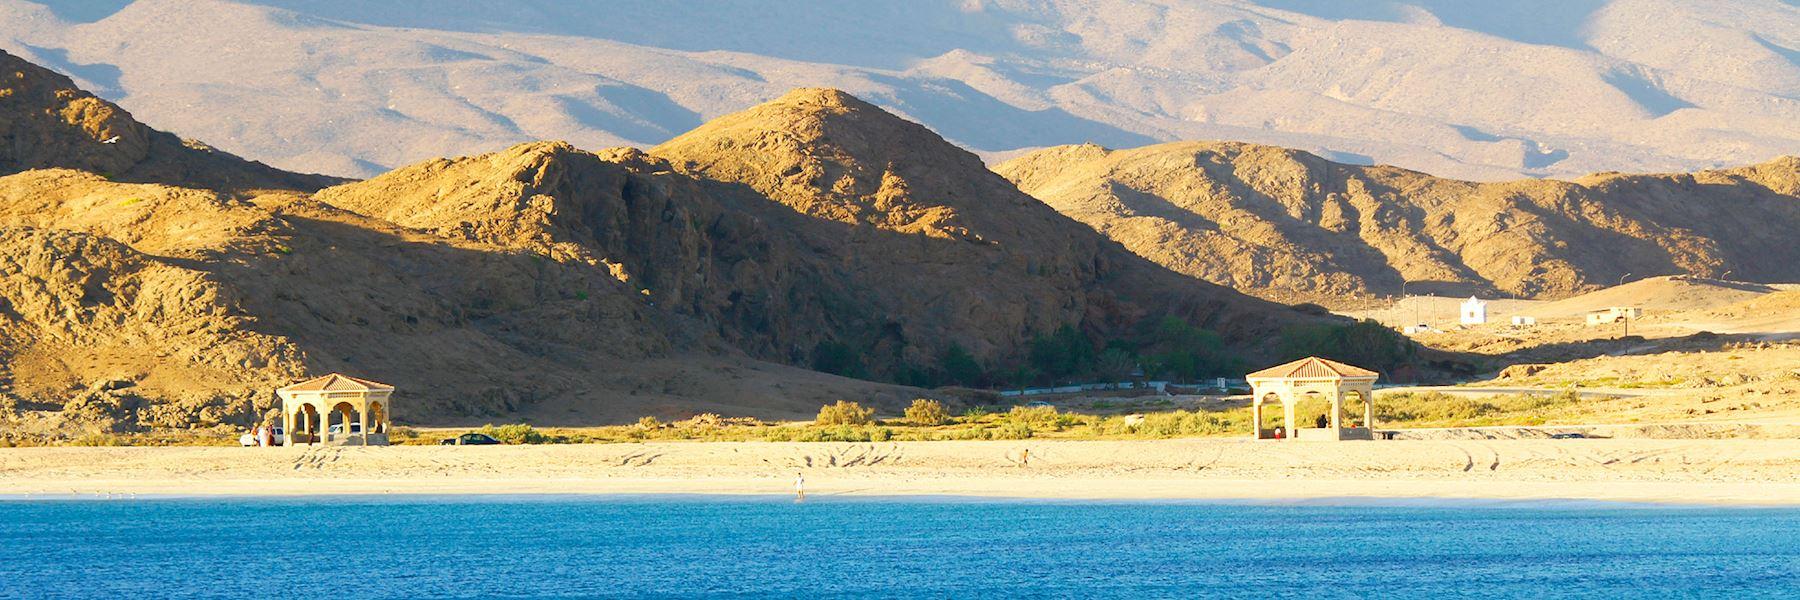 Oman trip ideas